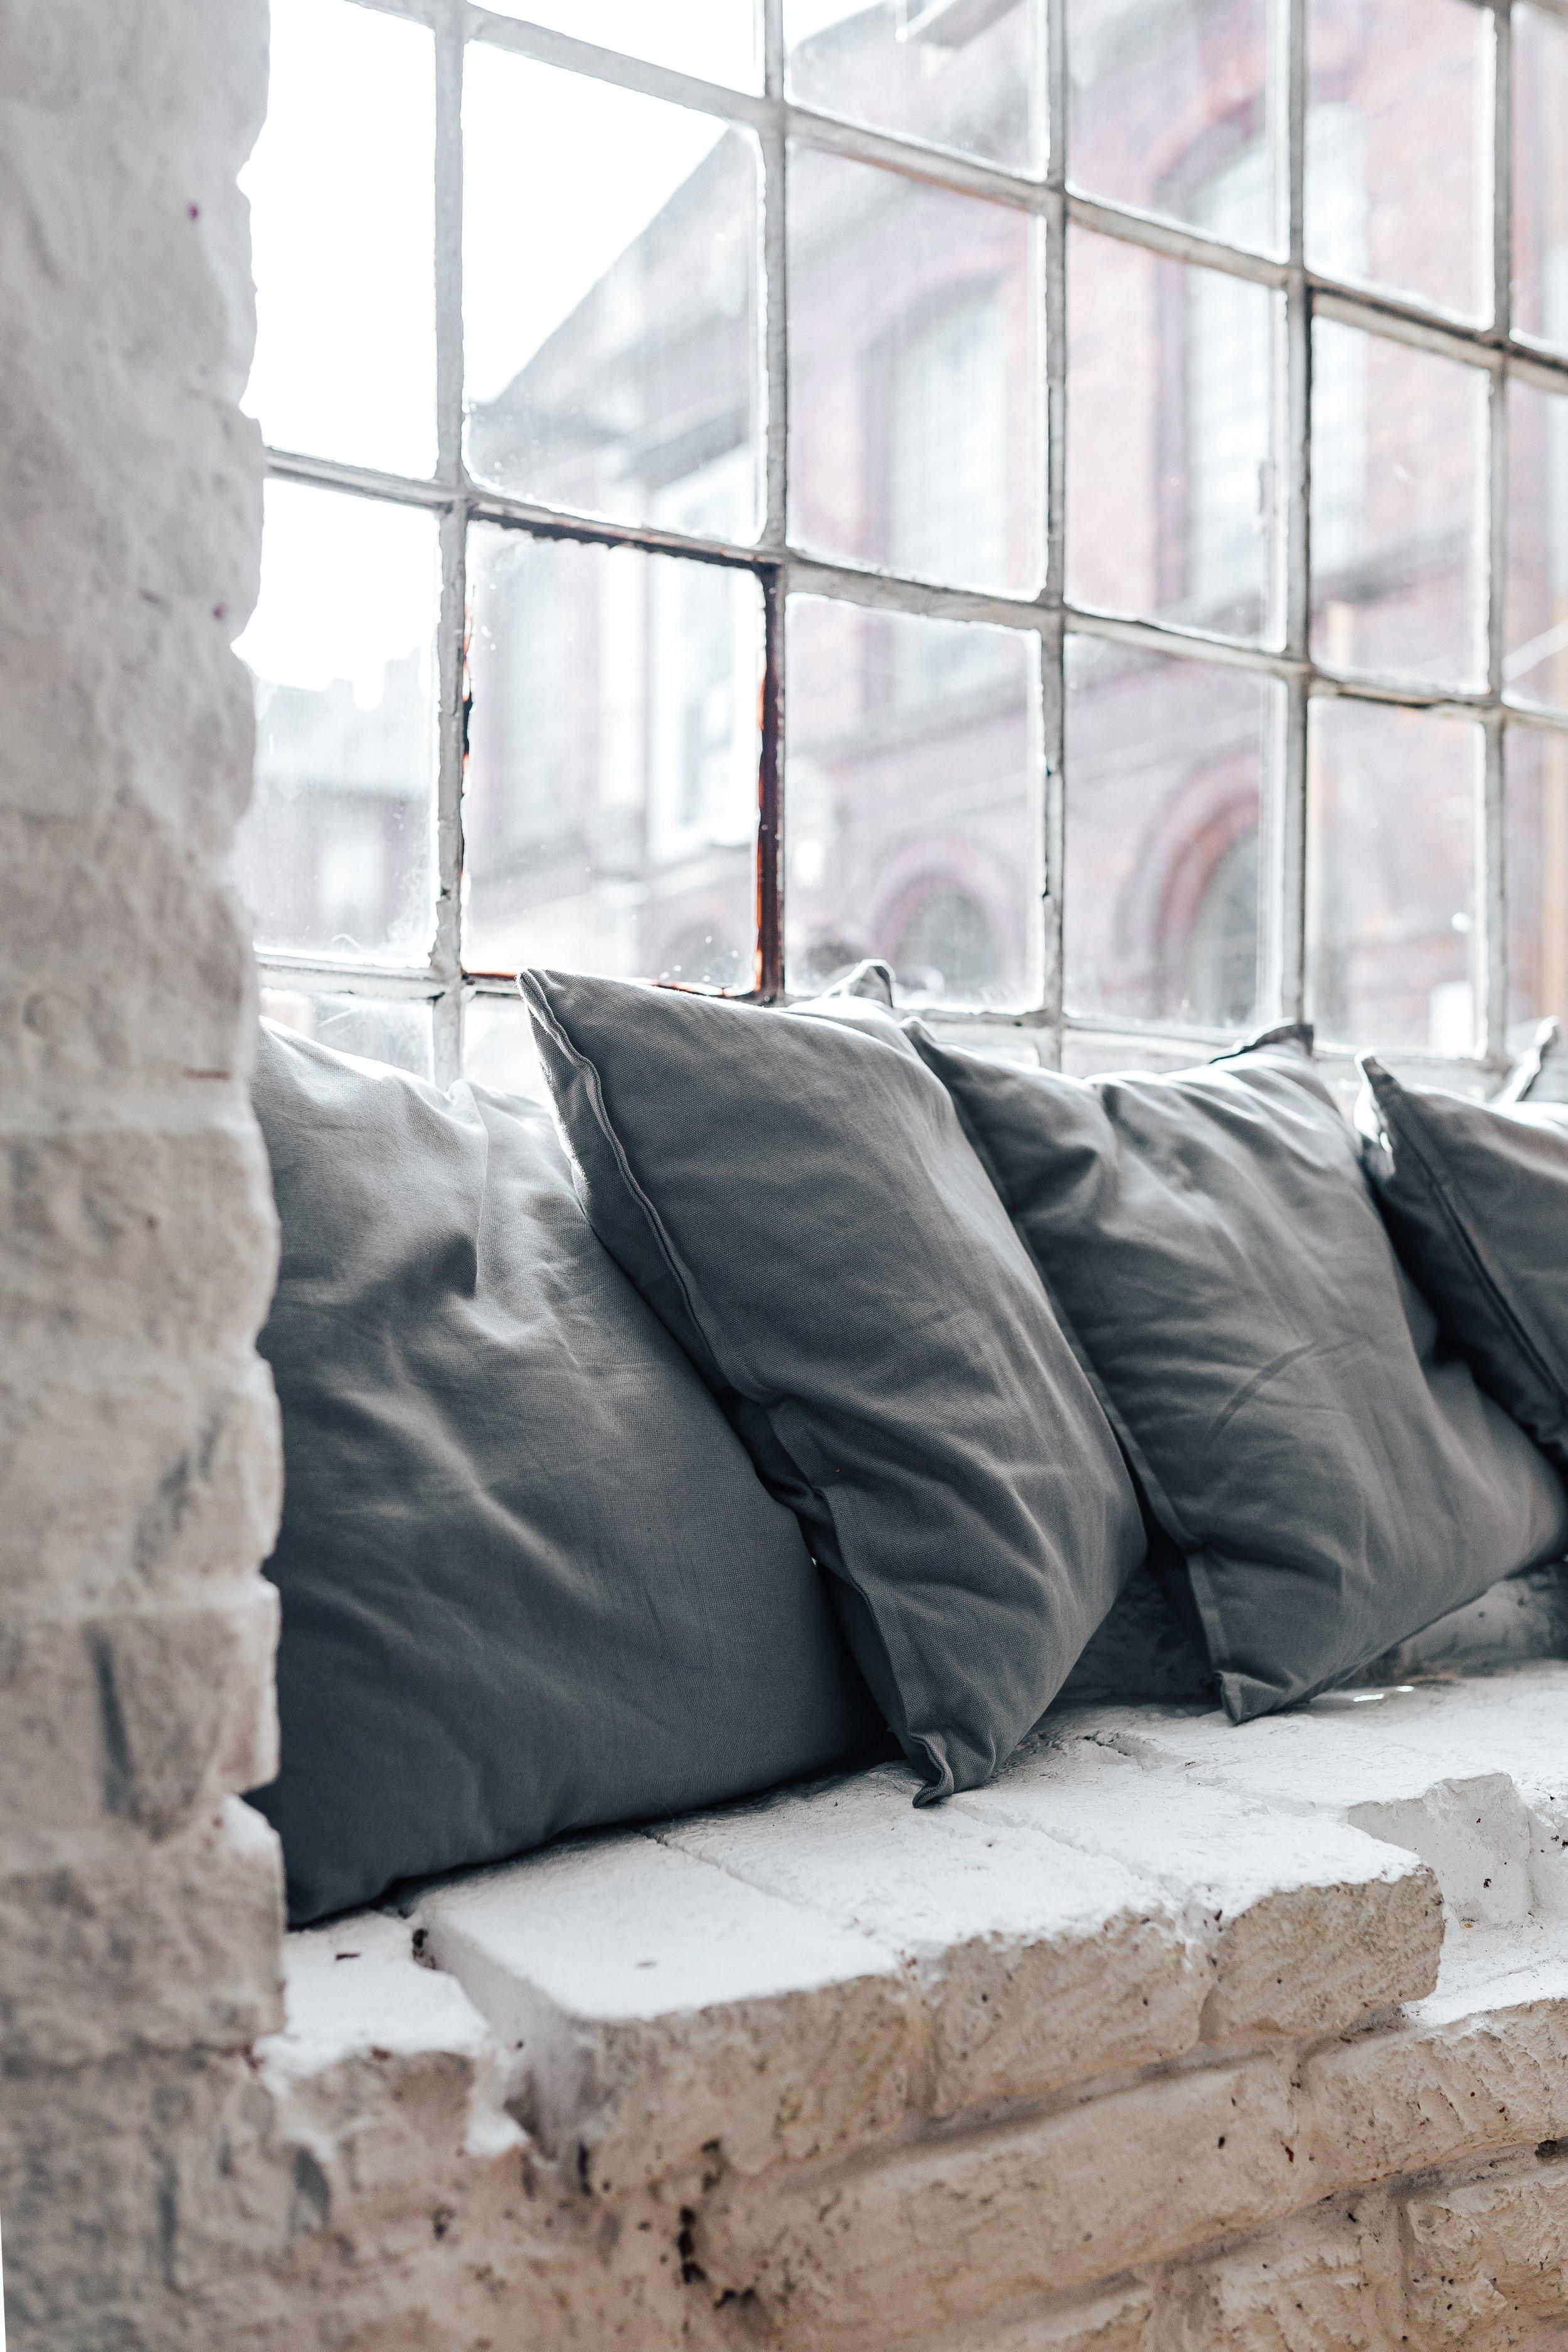 kaboompics_Pillows by the window.jpg